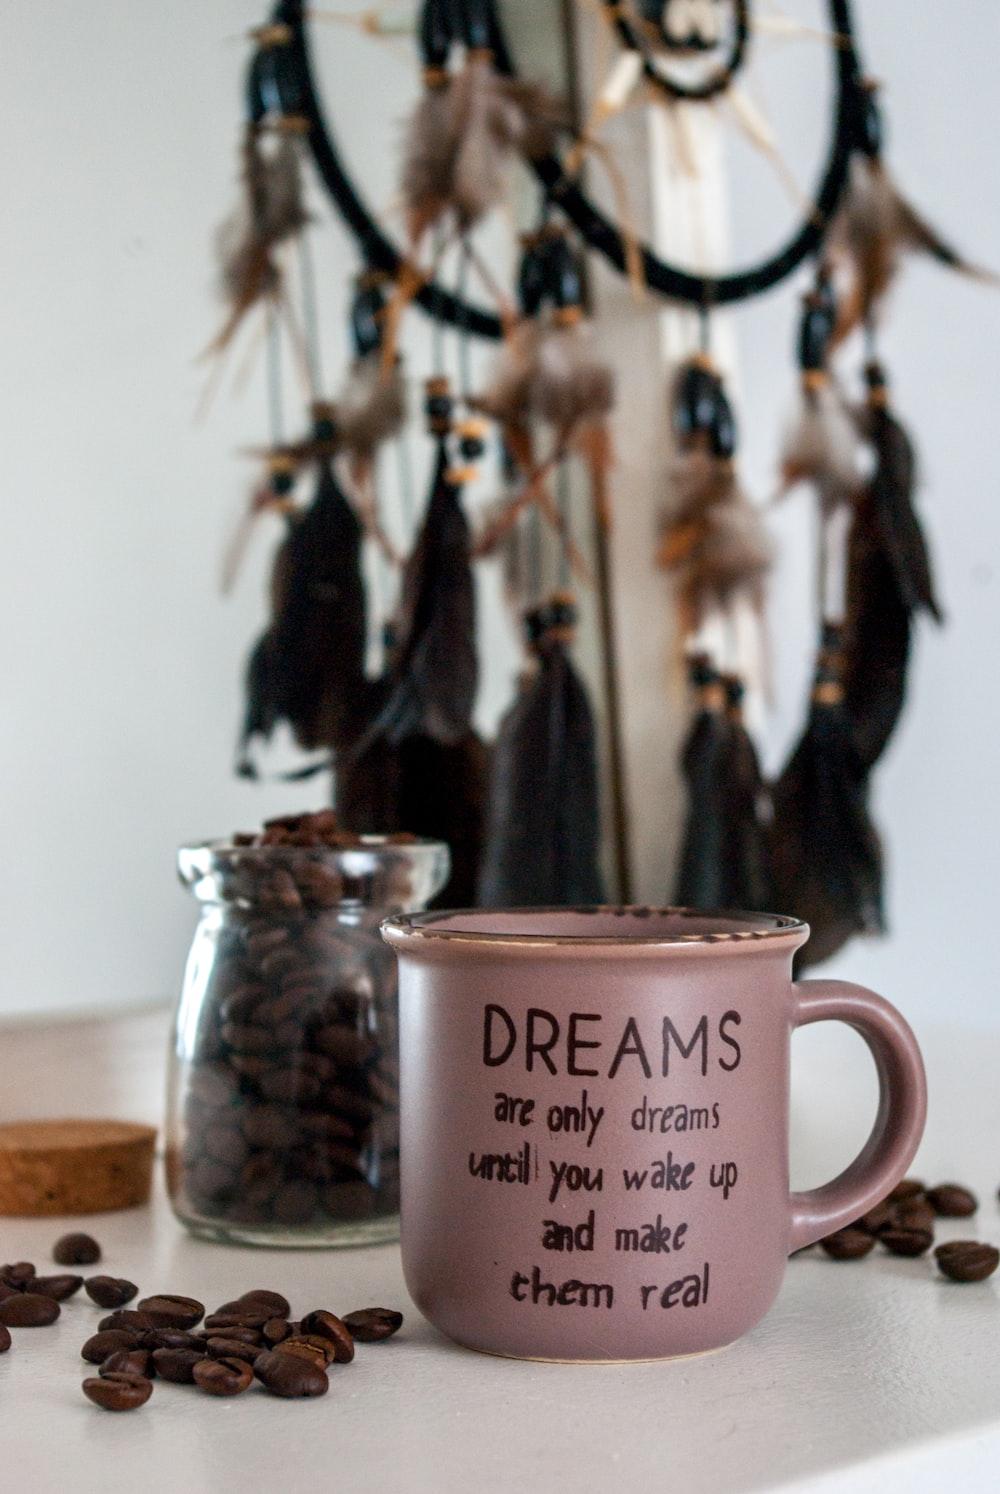 pink ceramic mug on brown wooden table